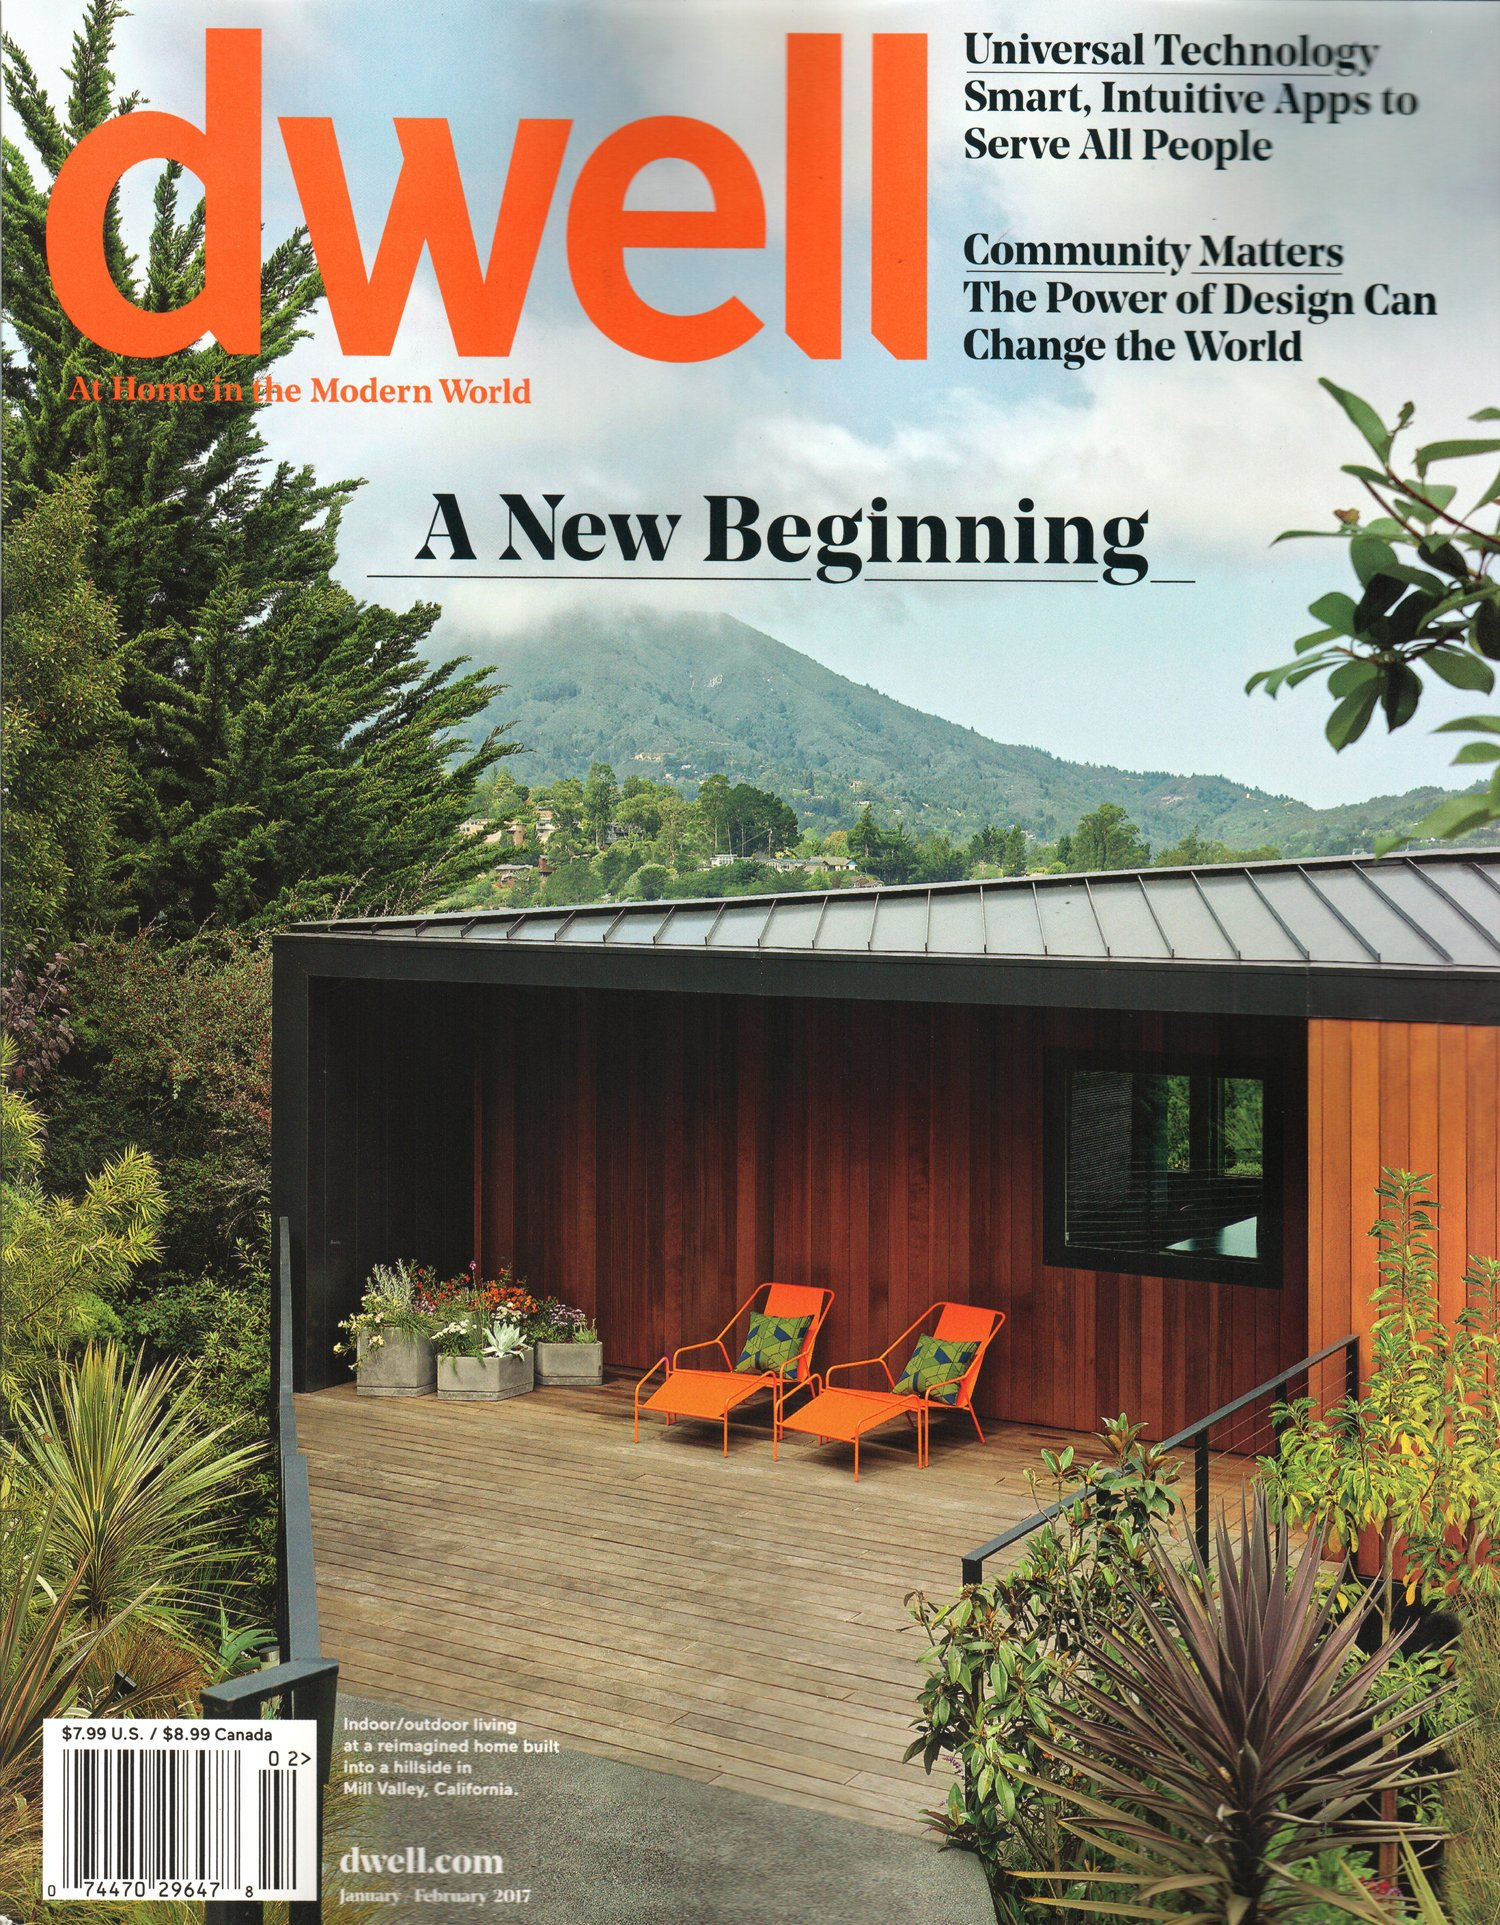 press_dwell cover.jpg